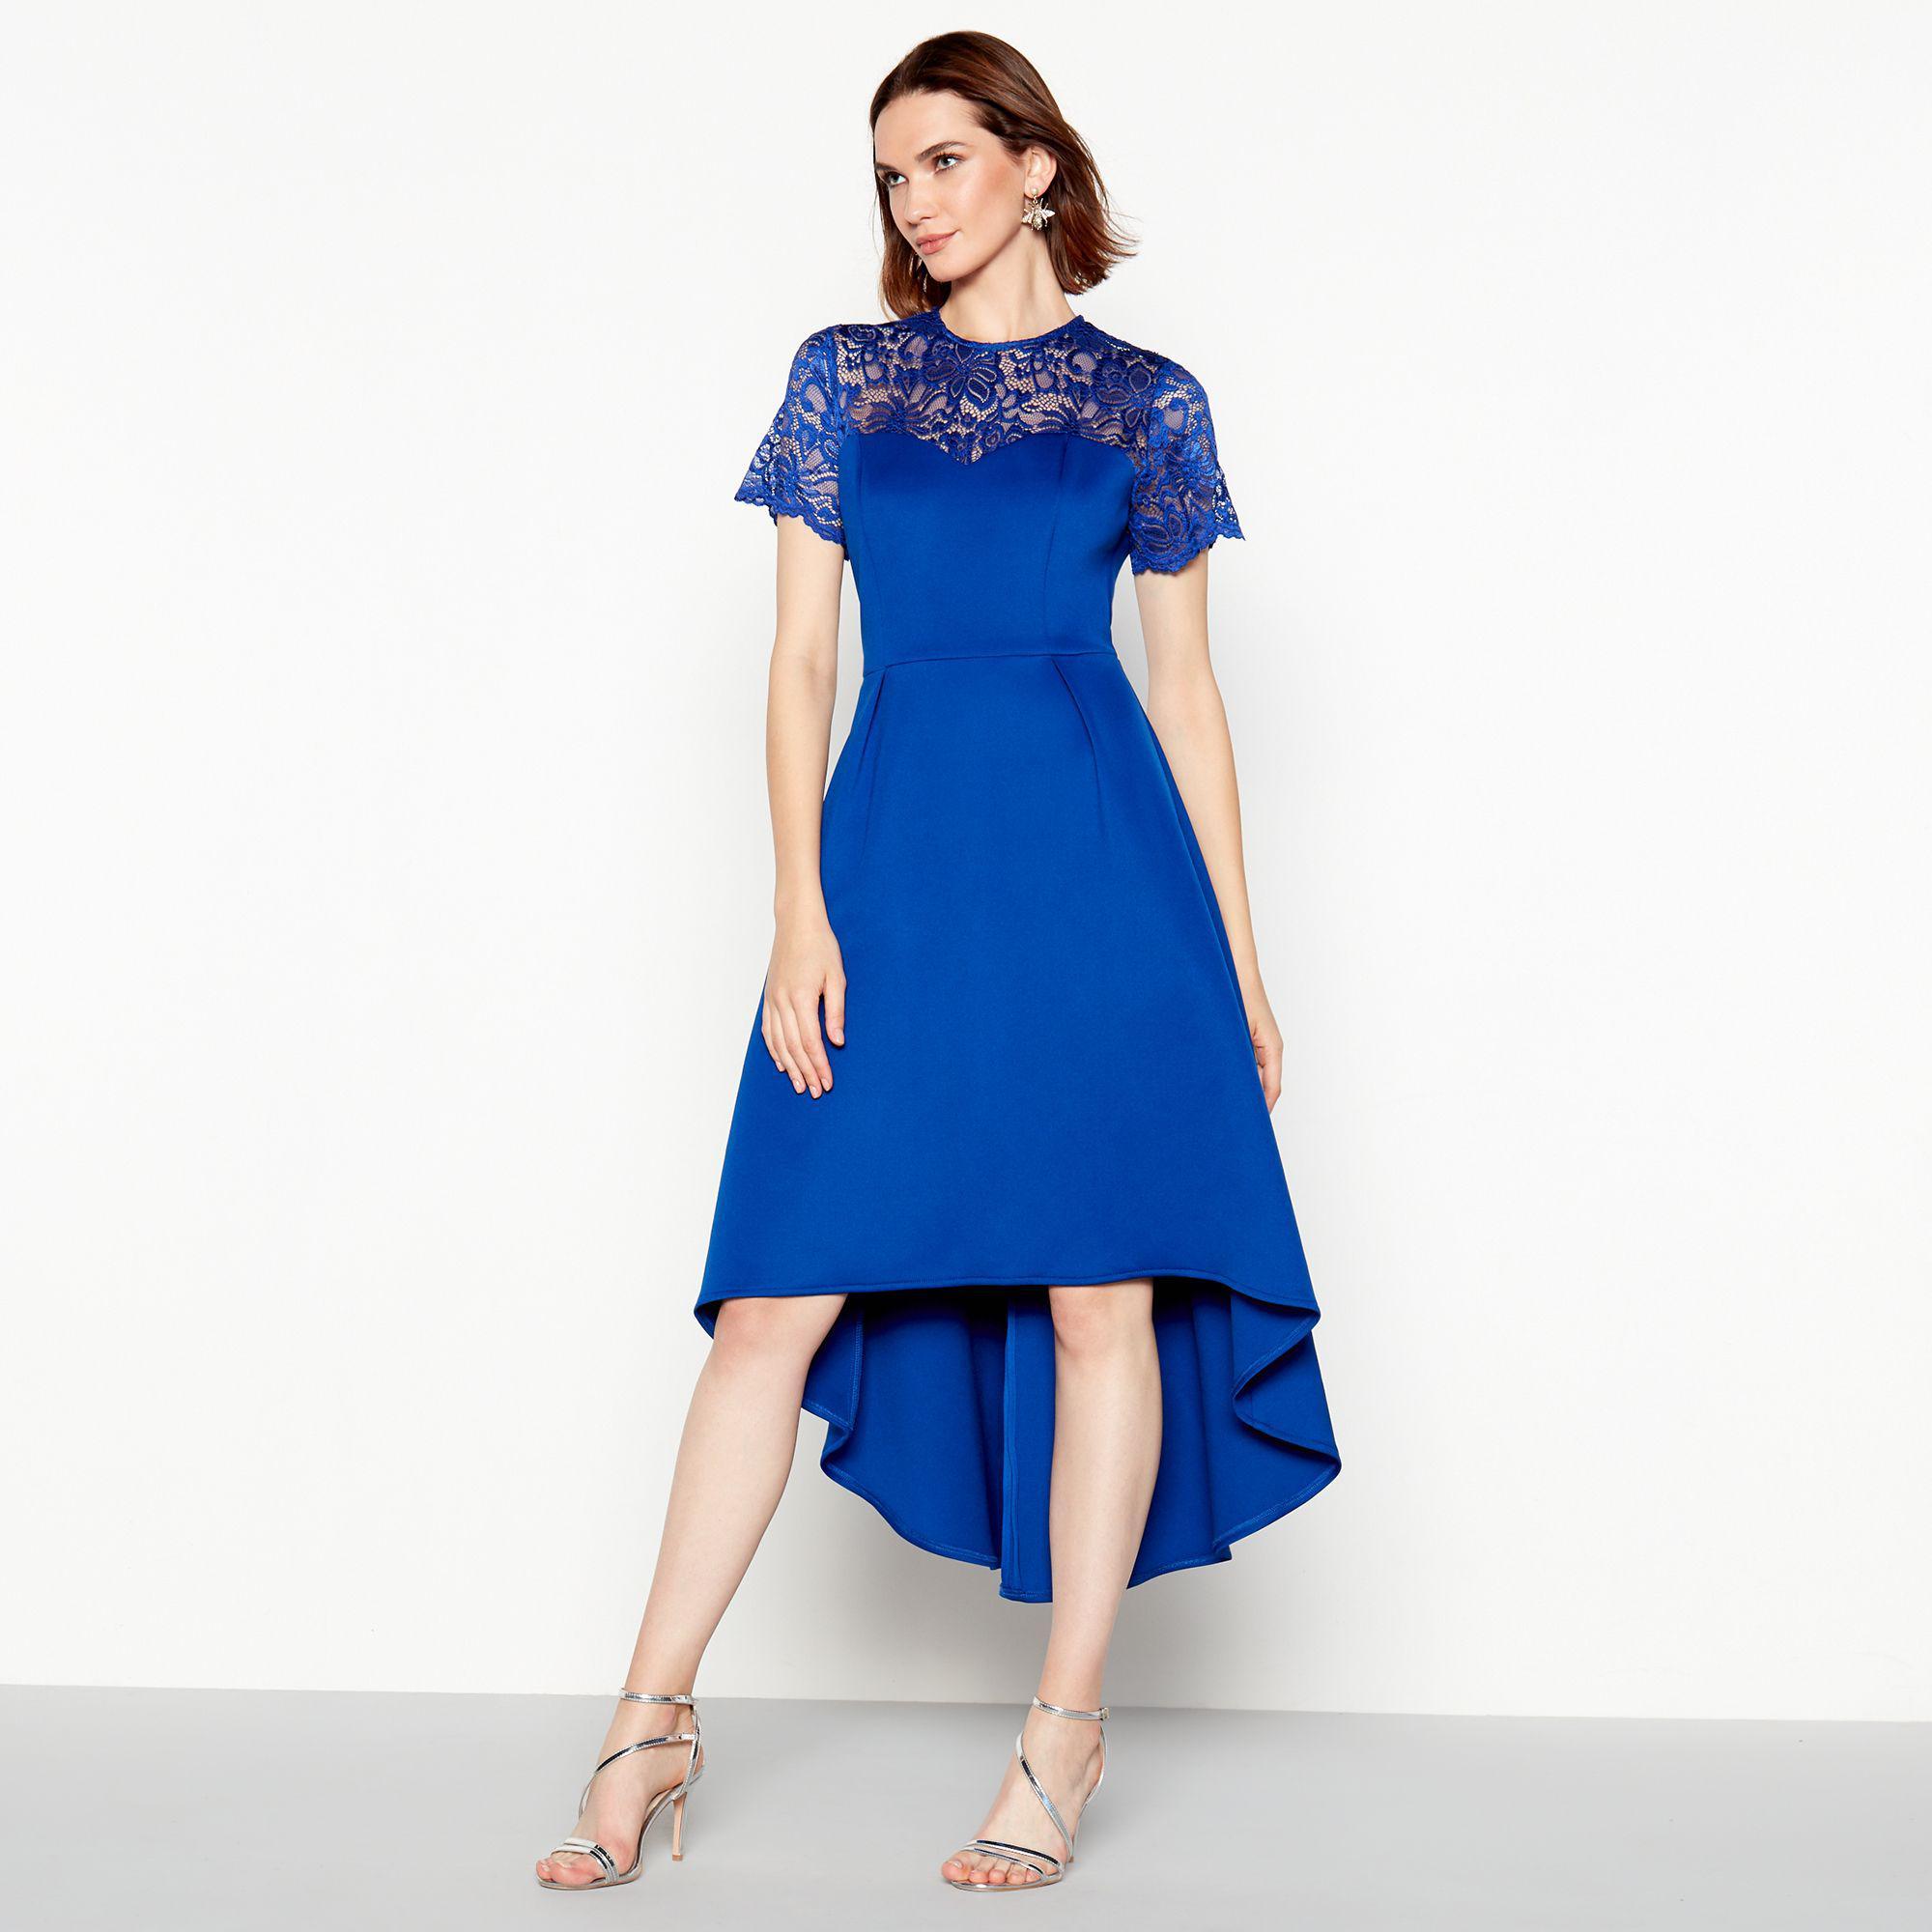 8a3ea70232 Début Bright Blue Lace Scuba  siena  High Low Prom Dress in Blue ...